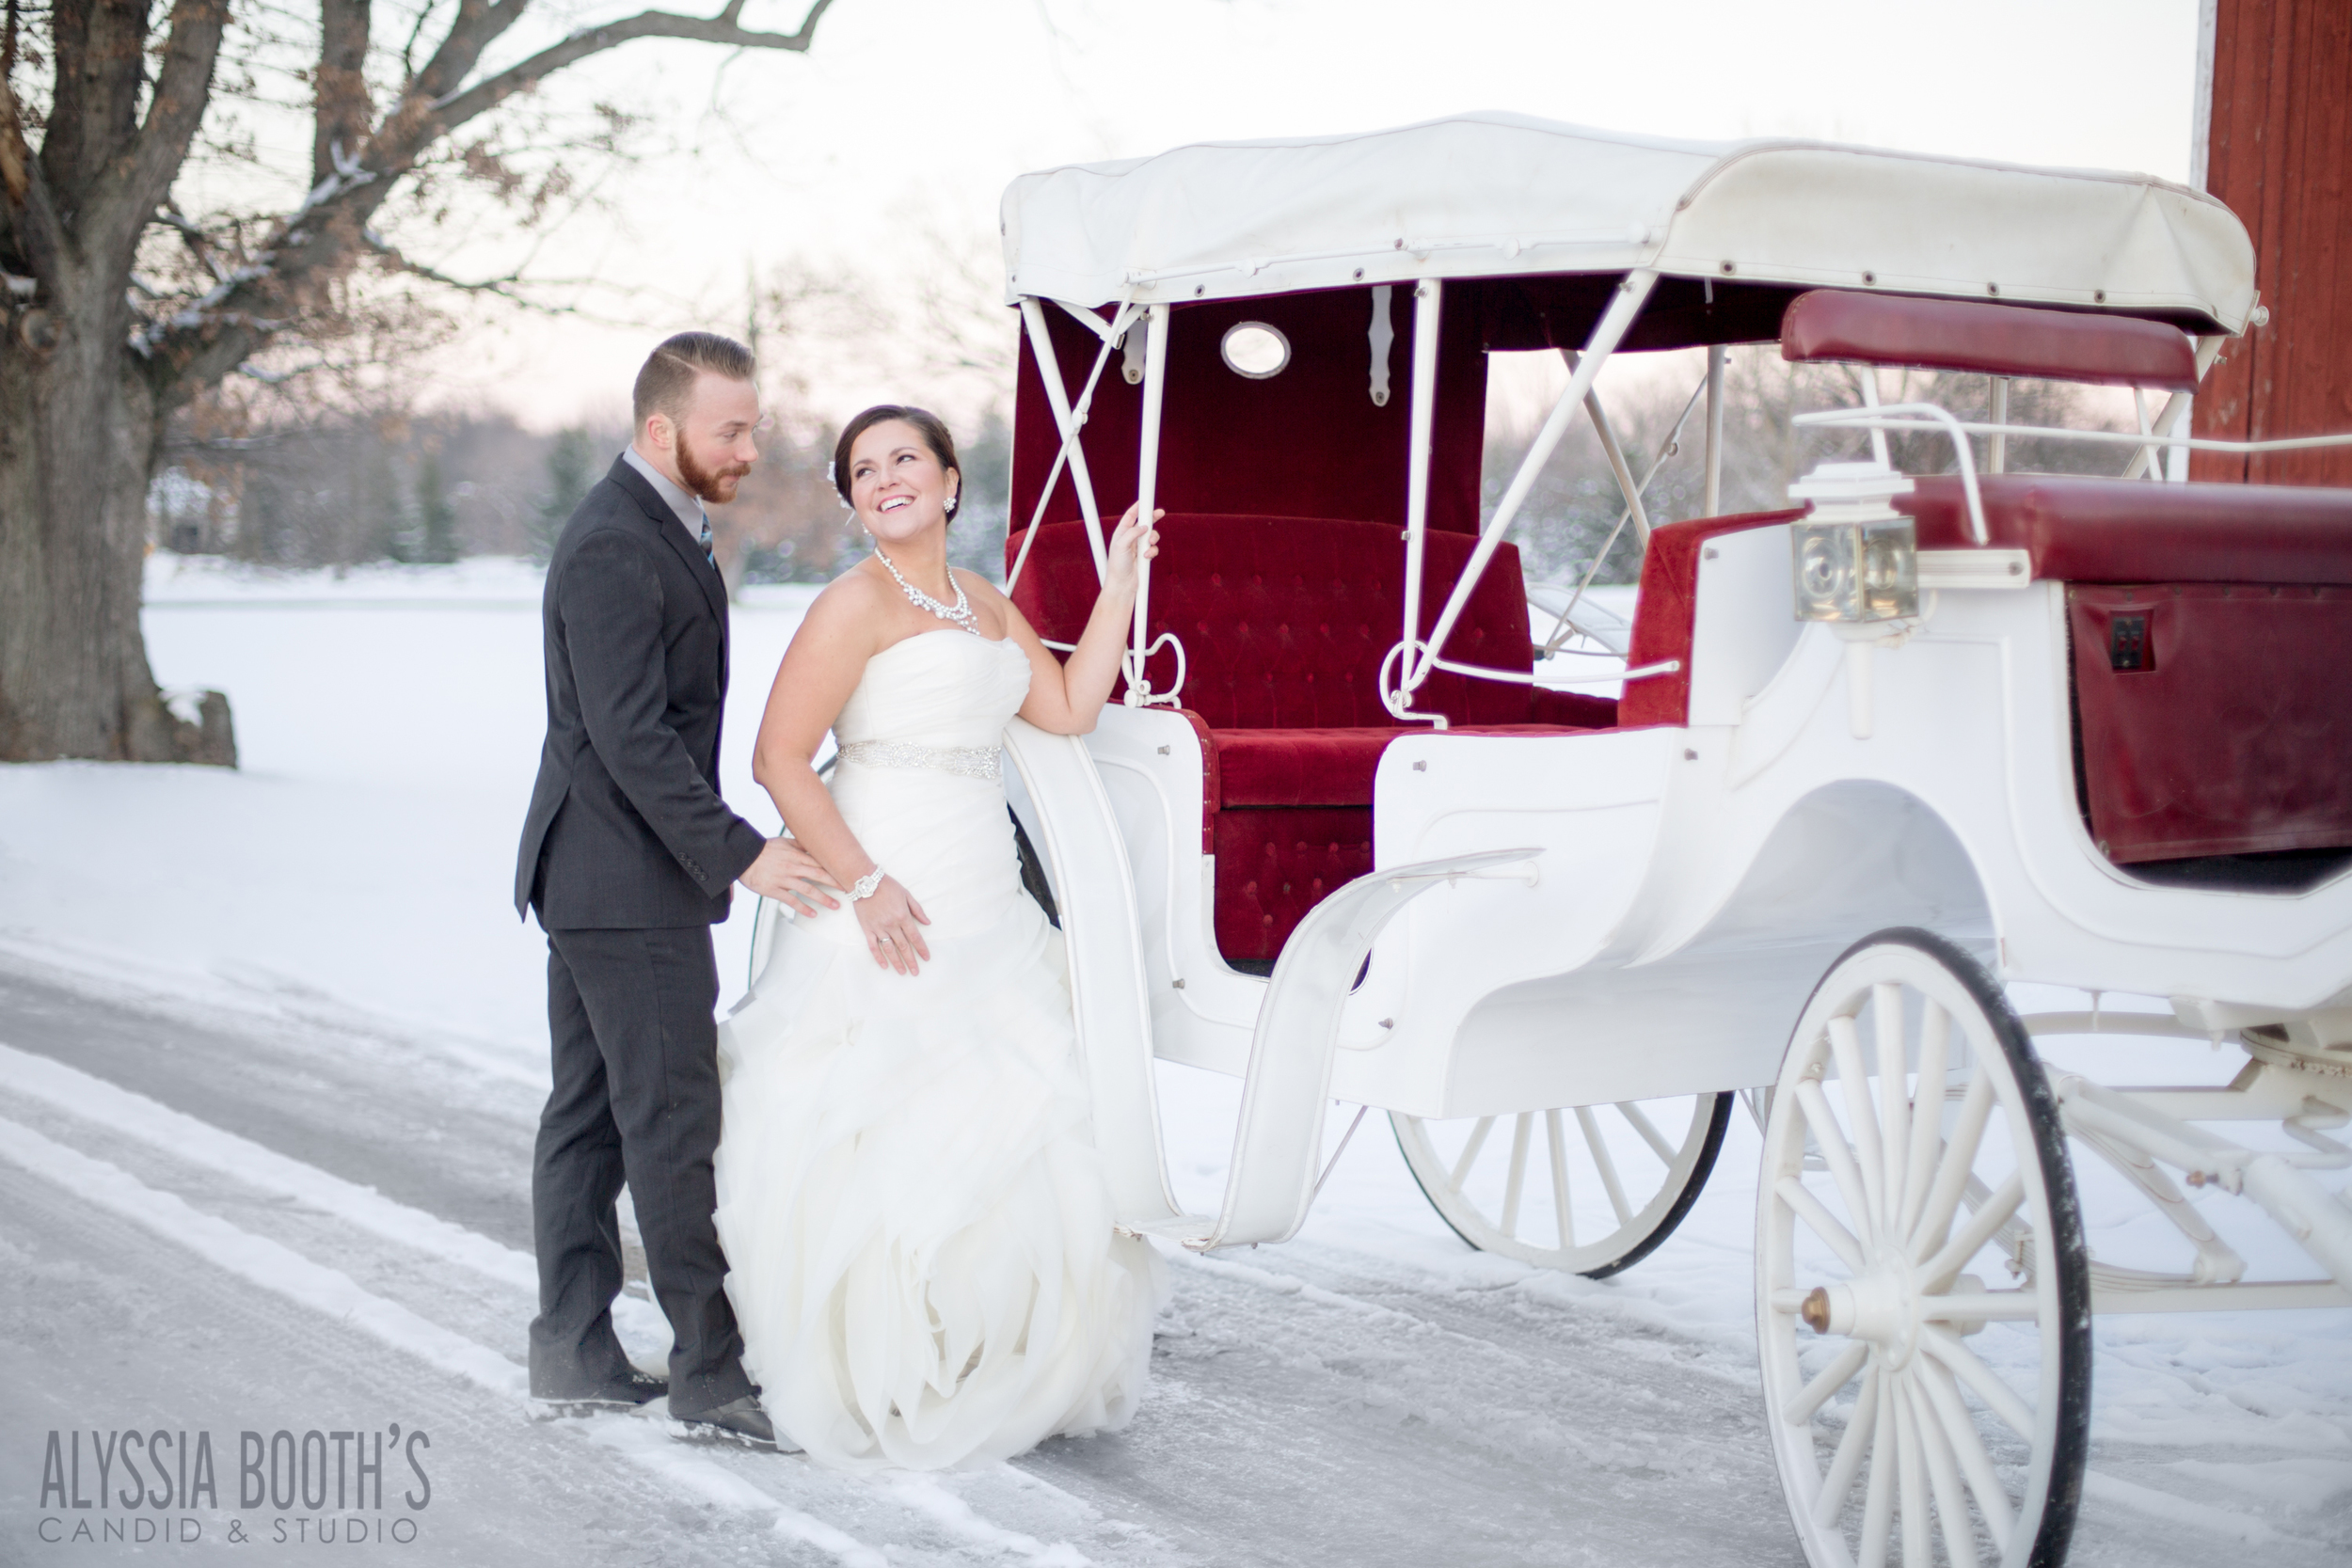 Romance Session | Bride & Groom | Alyssia Booth's Candid & Studio | Michigan Photographer